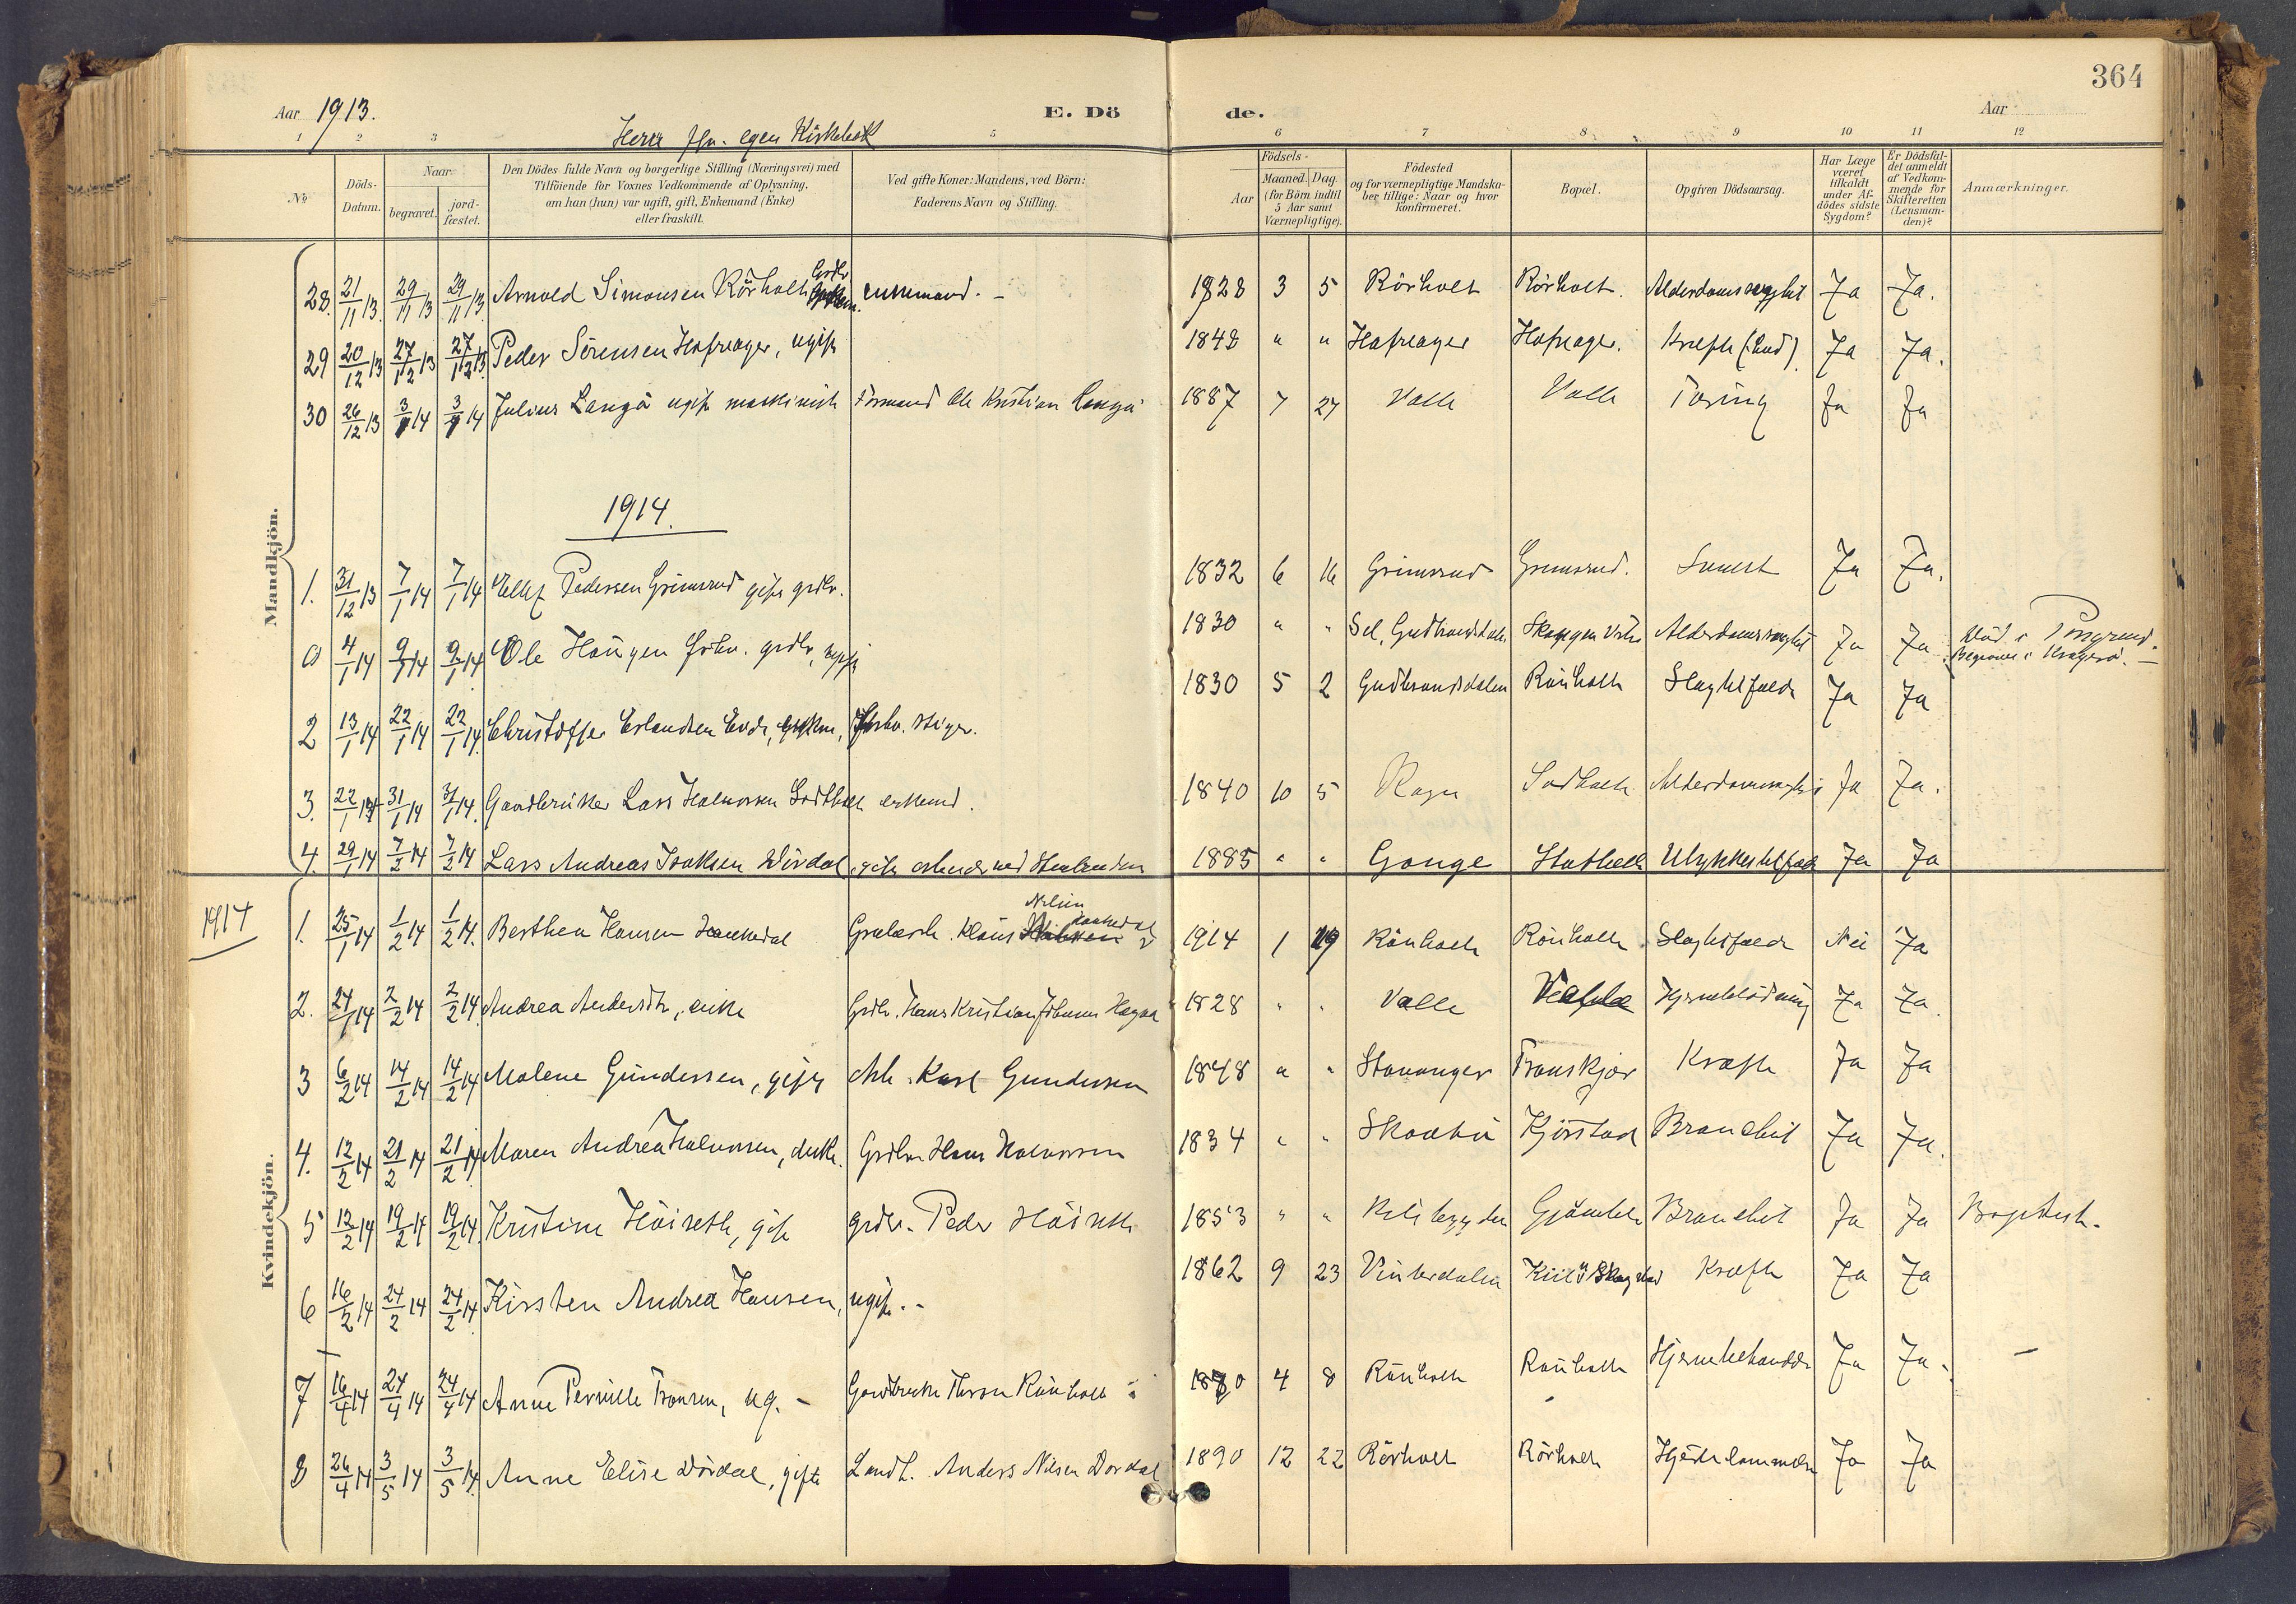 SAKO, Bamble kirkebøker, F/Fa/L0009: Ministerialbok nr. I 9, 1901-1917, s. 364